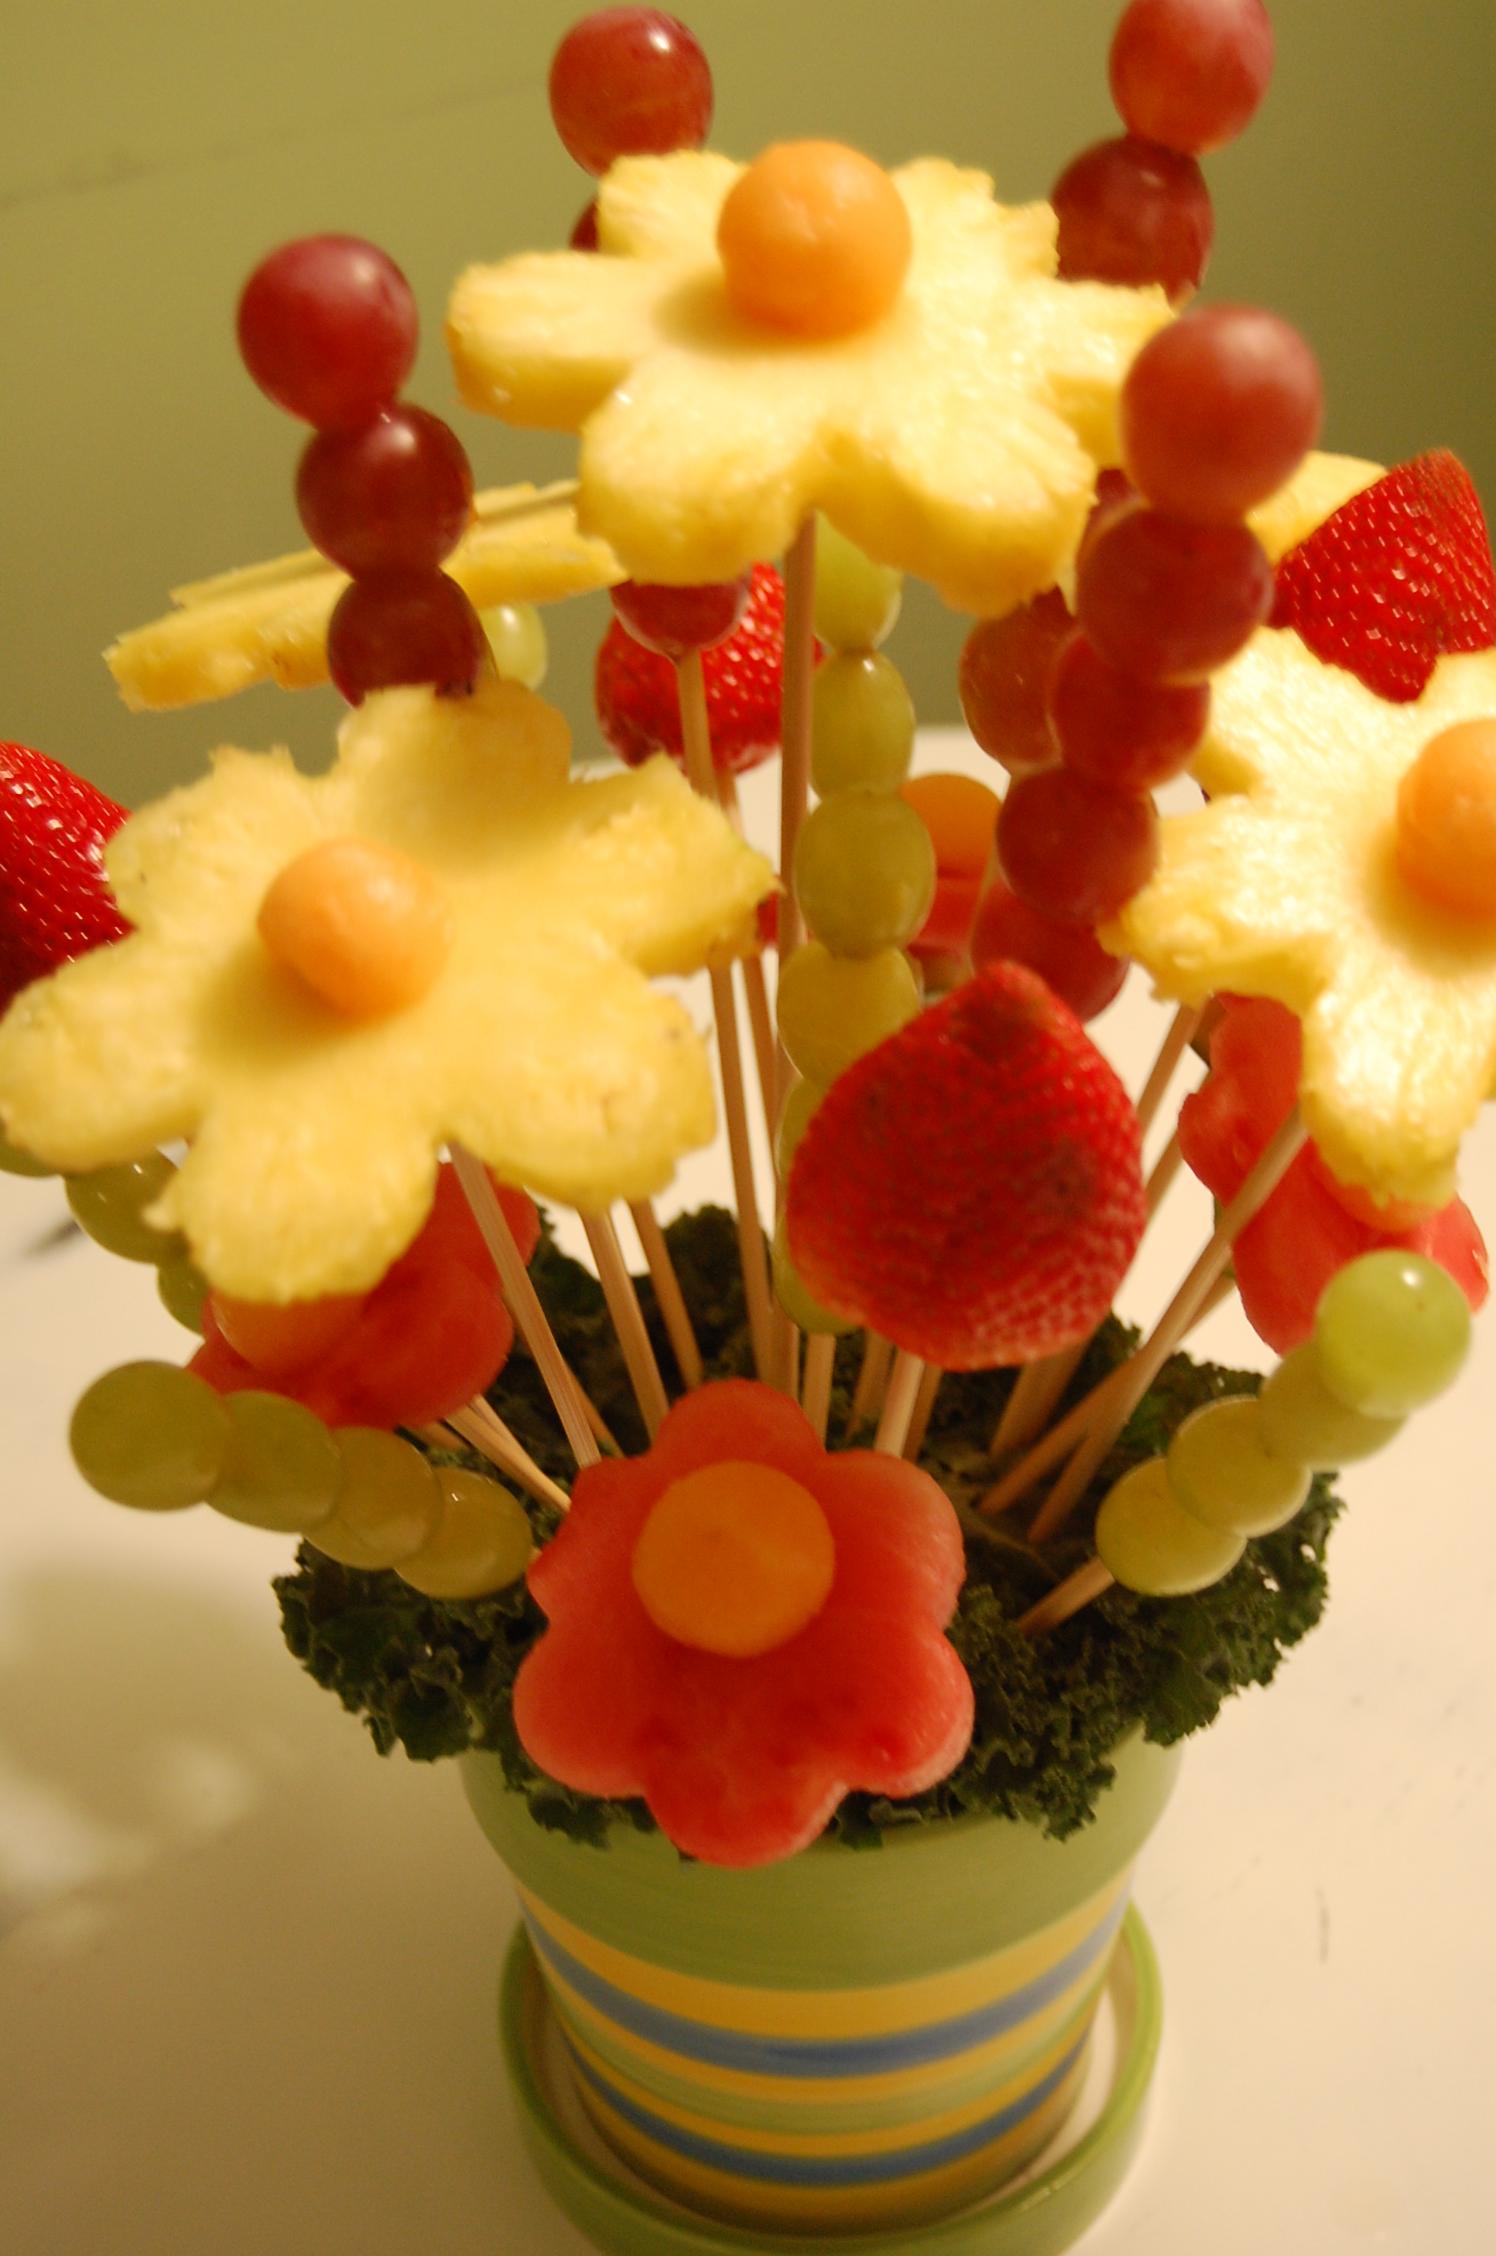 Edible Fruit Arrangement | Tasty Kitchen: A Happy Recipe ...